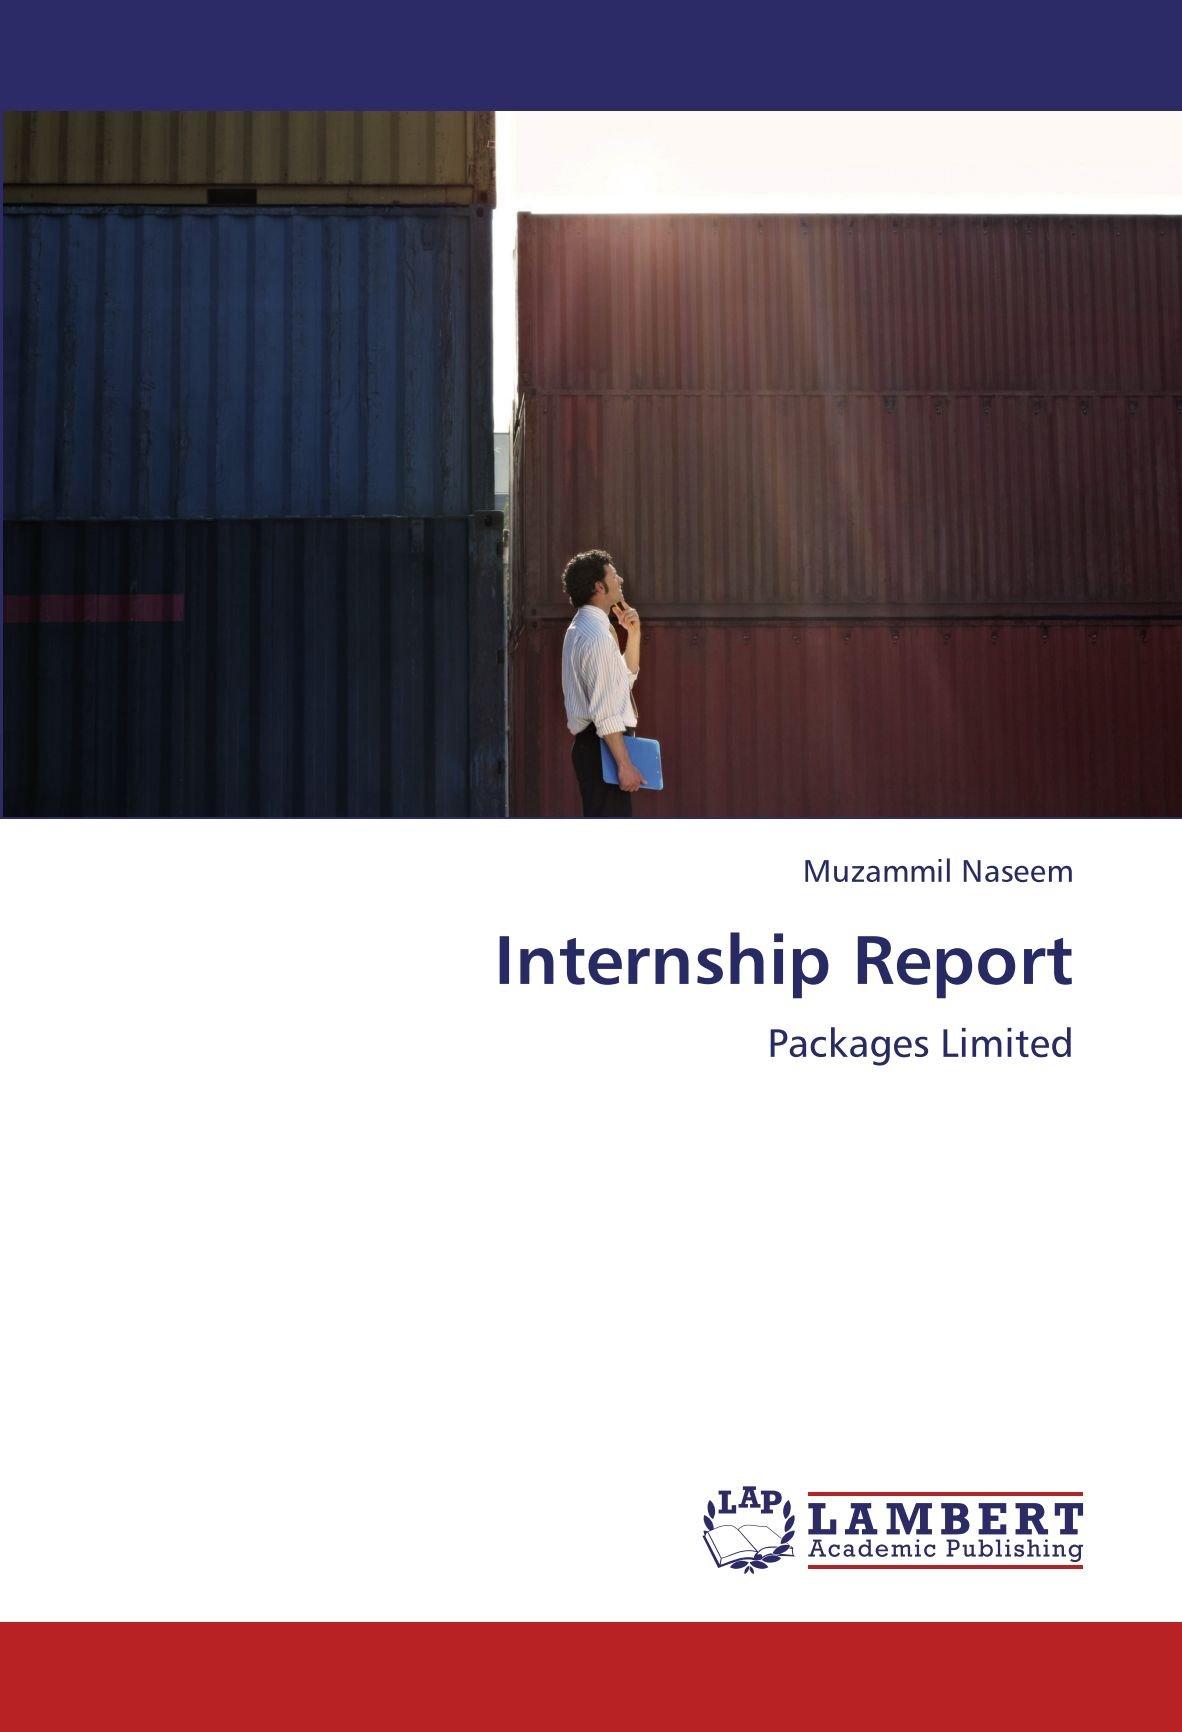 Internship Report: Packages Limited: Muzammil Naseem